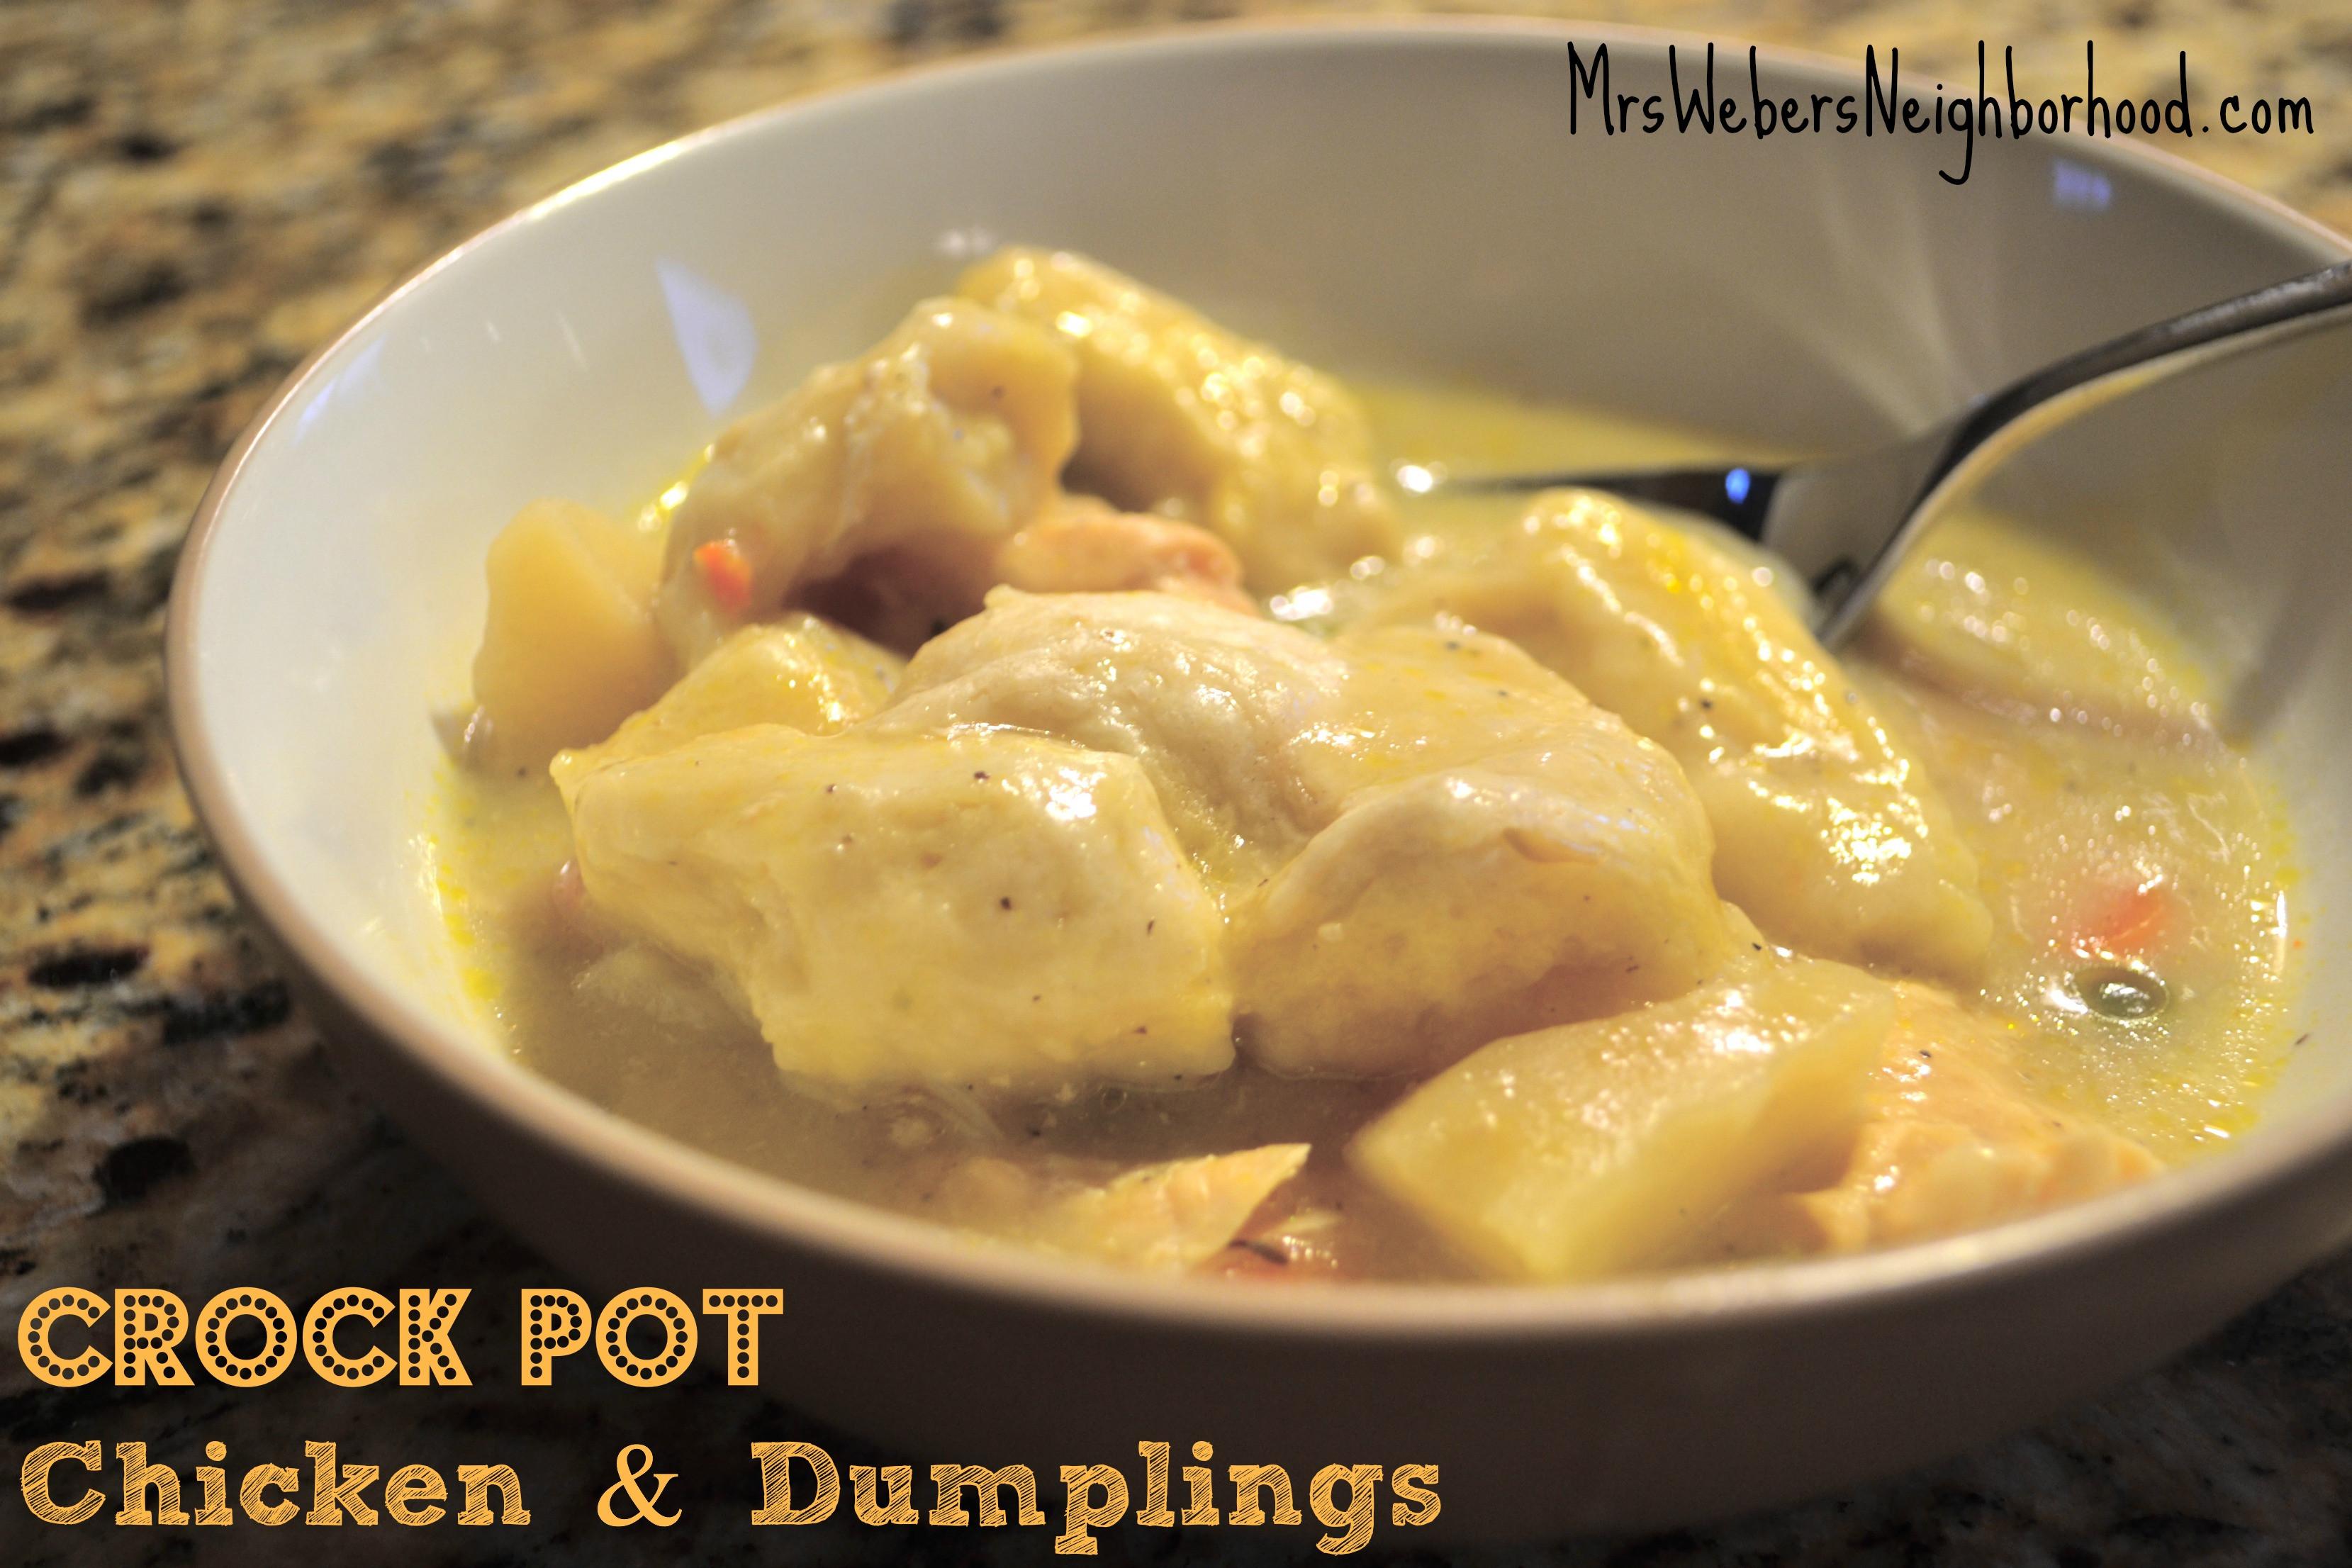 Crock Pot Chicken And Dumplings  Recipe Crock Pot Chicken and Dumplings